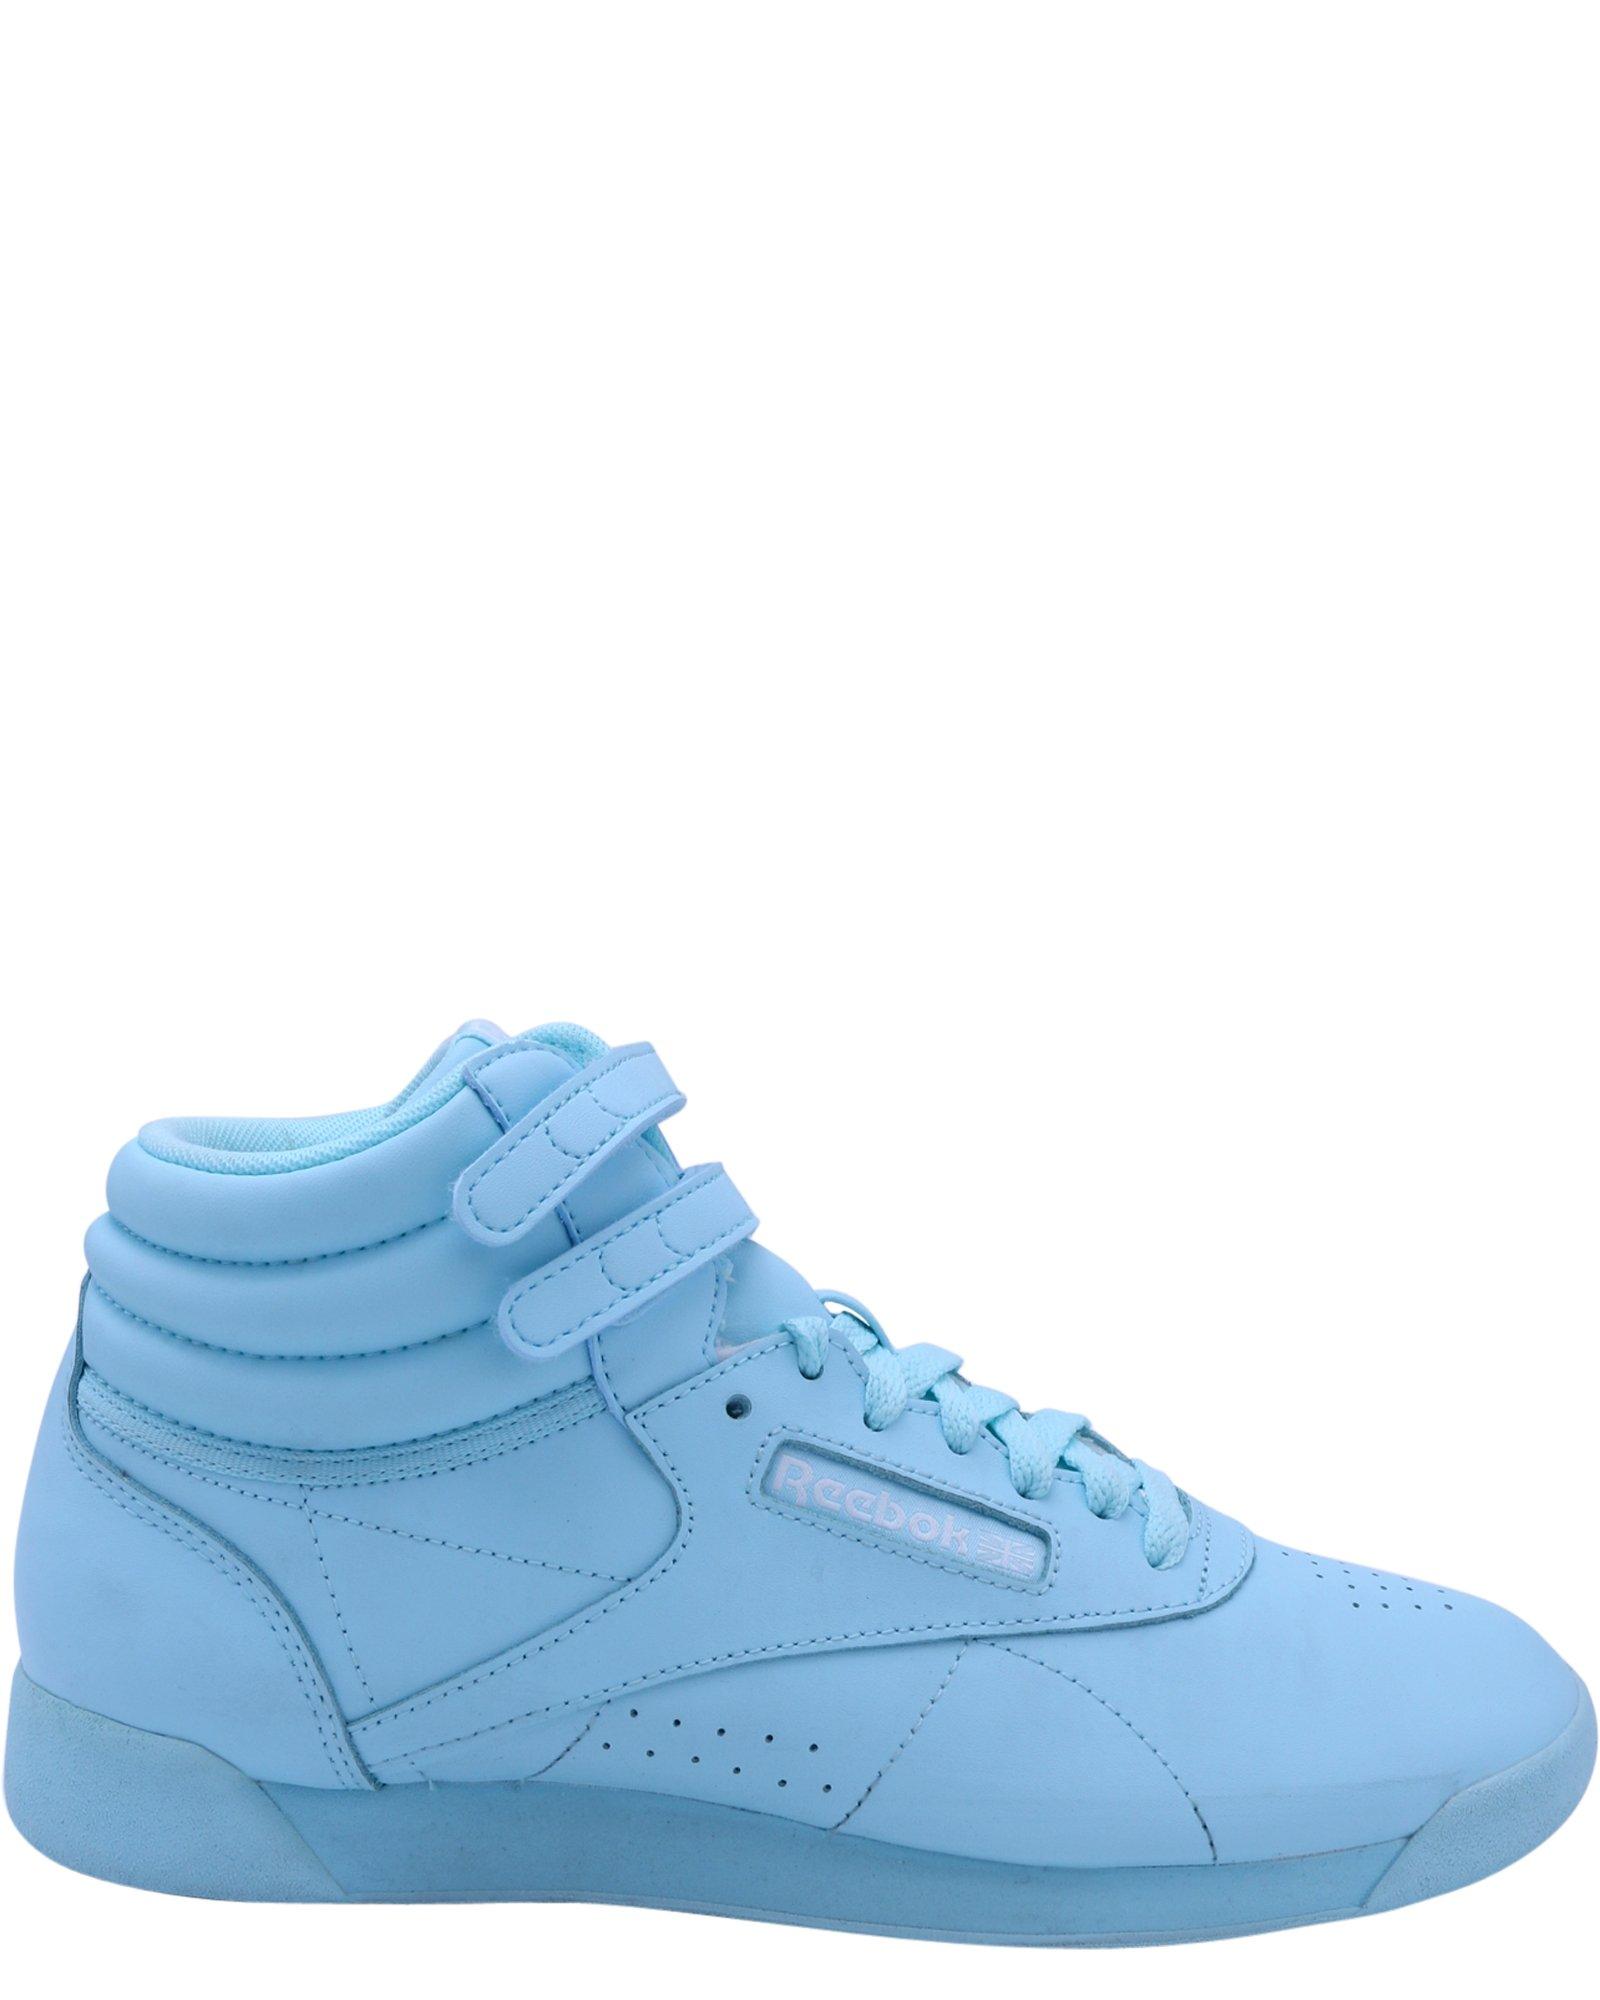 Reebok Women's F/S Hi Colors Sneaker, Blue Lagoon/White, 8.5 M US